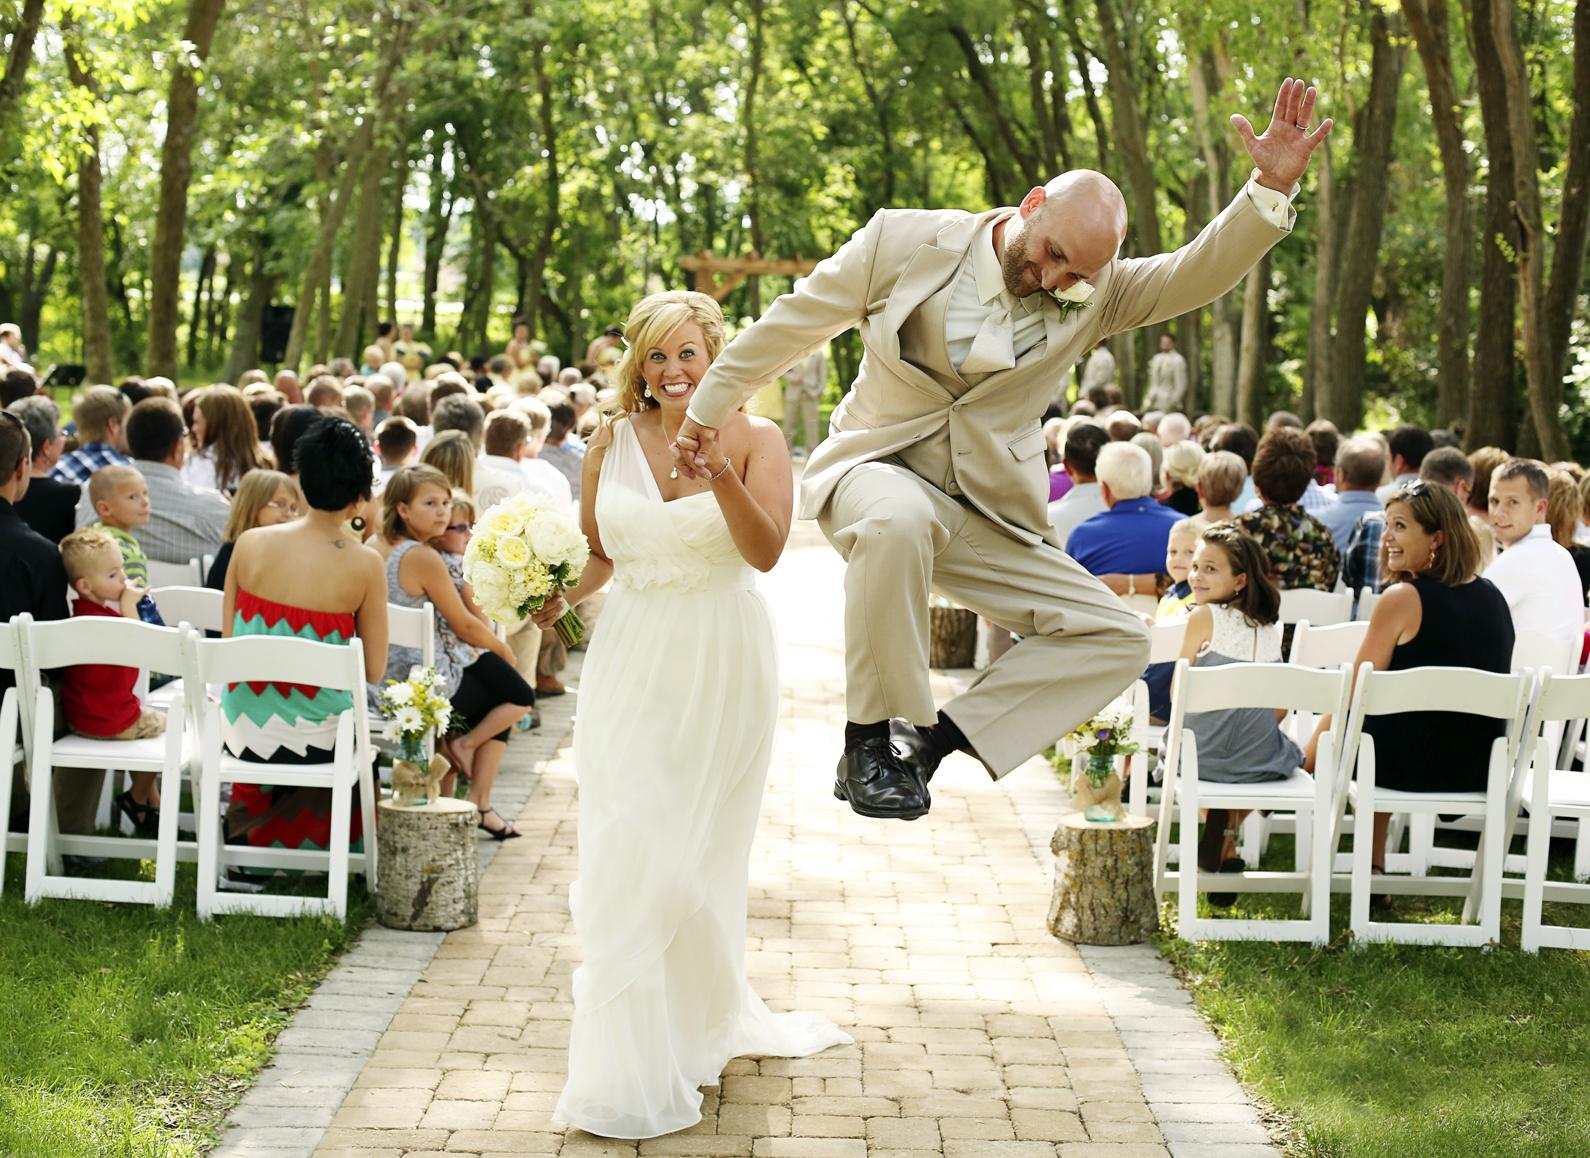 Groom Jumping.jpg